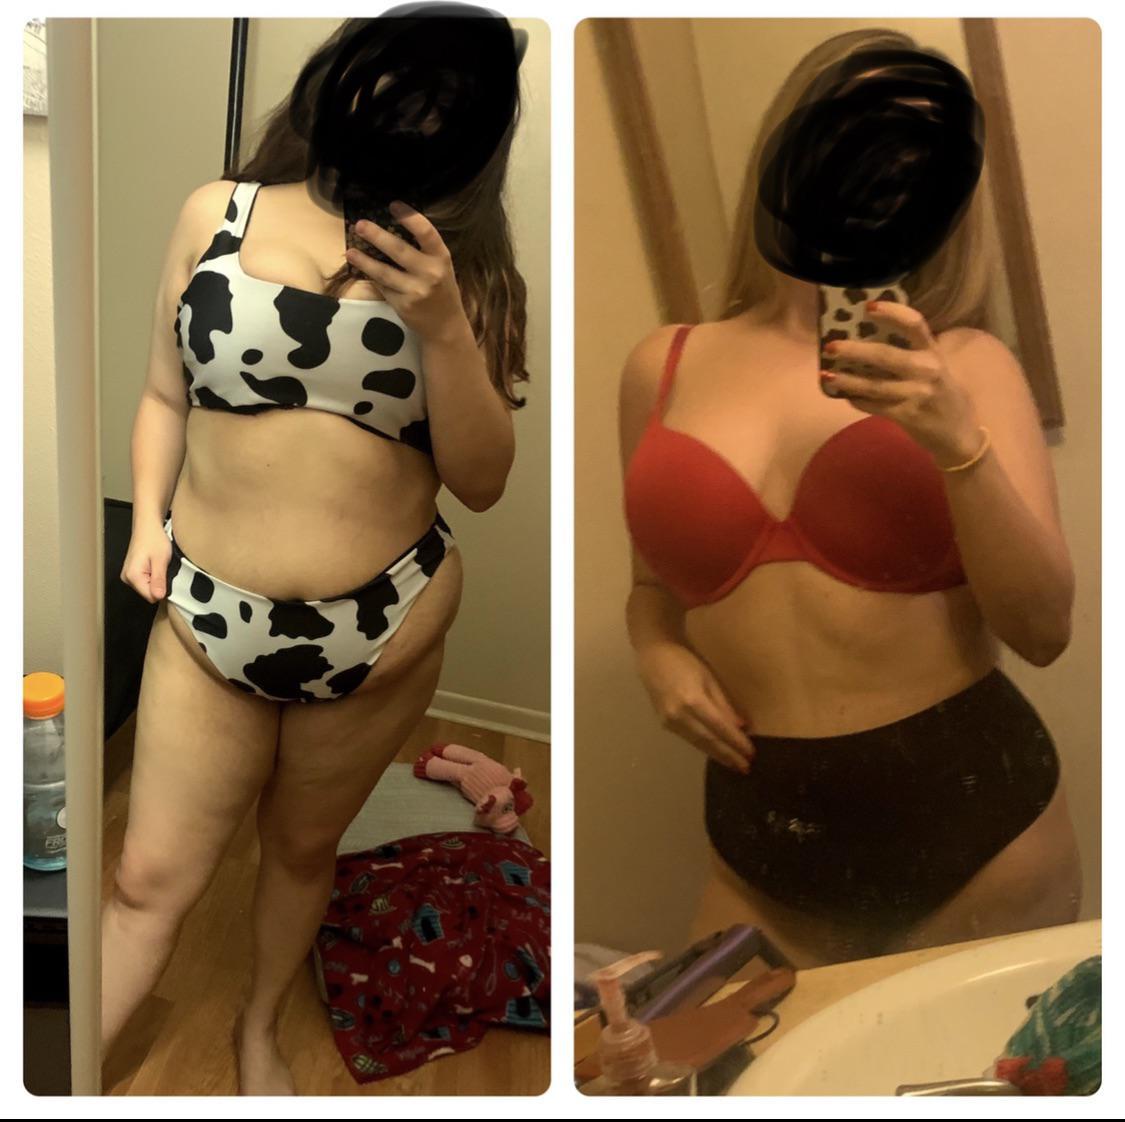 5 foot Female Progress Pics of 59 lbs Weight Loss 197 lbs to 138 lbs